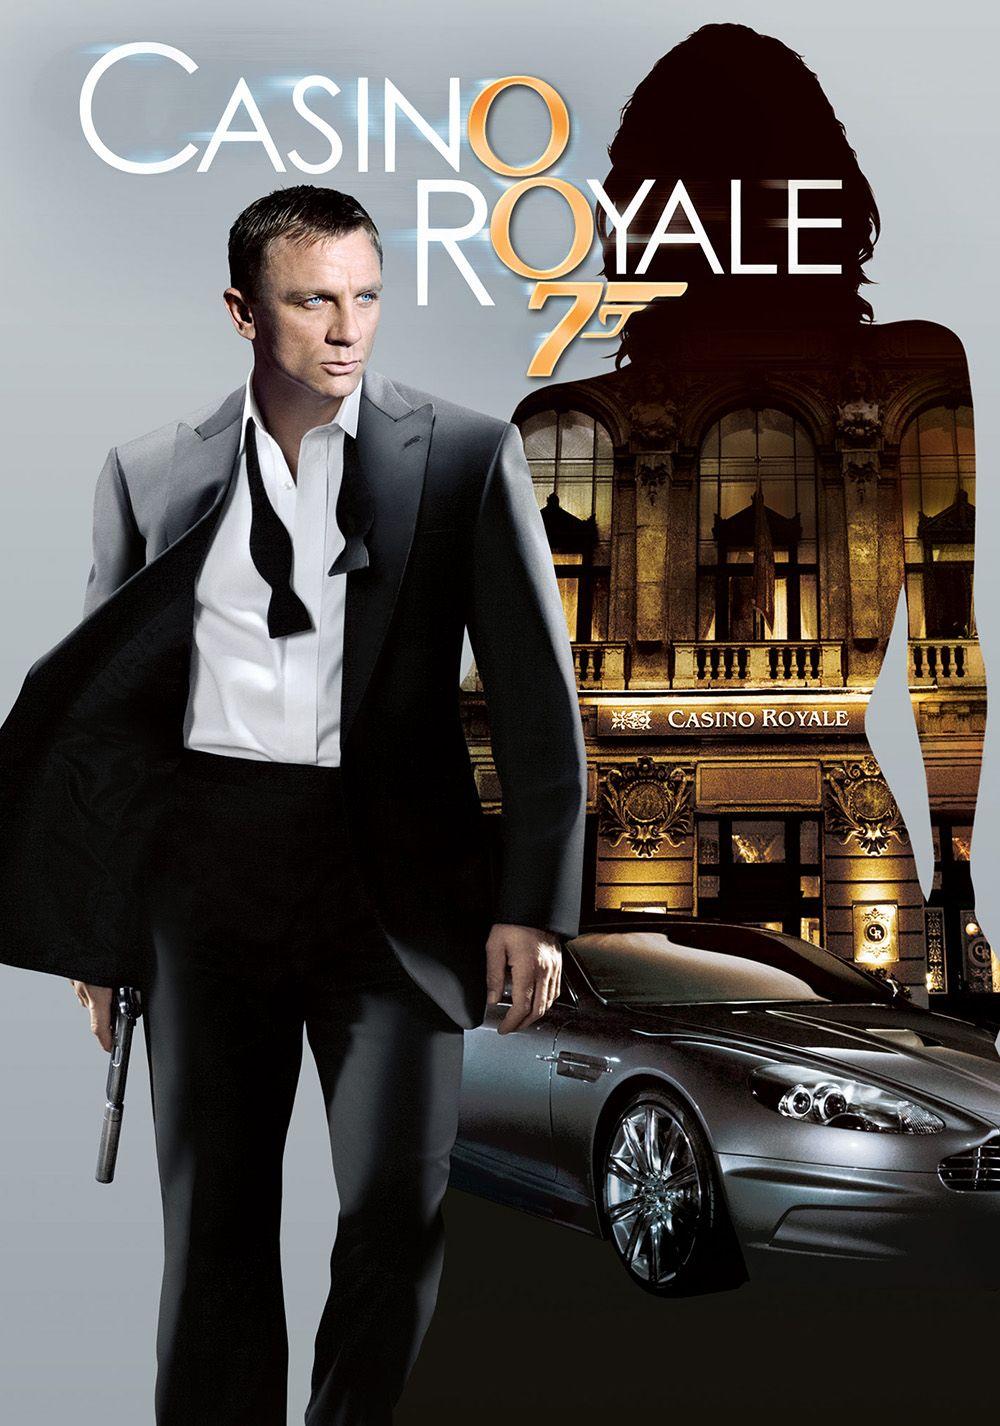 Casino royale free stream best hotels near soaring eagle casino